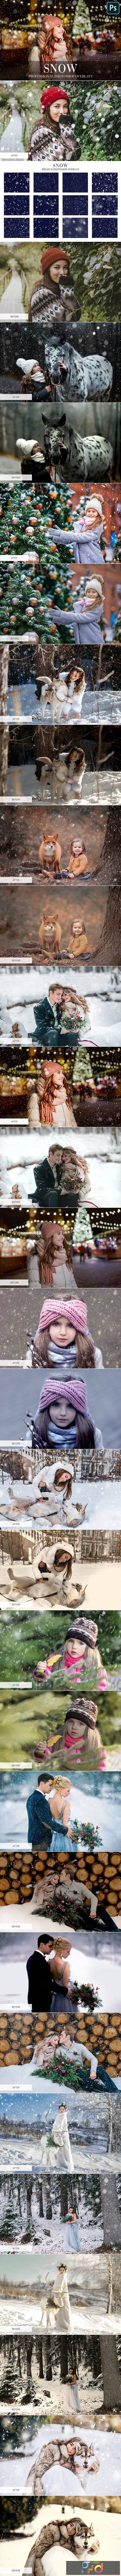 Snow Photo Overlays 4942645 1